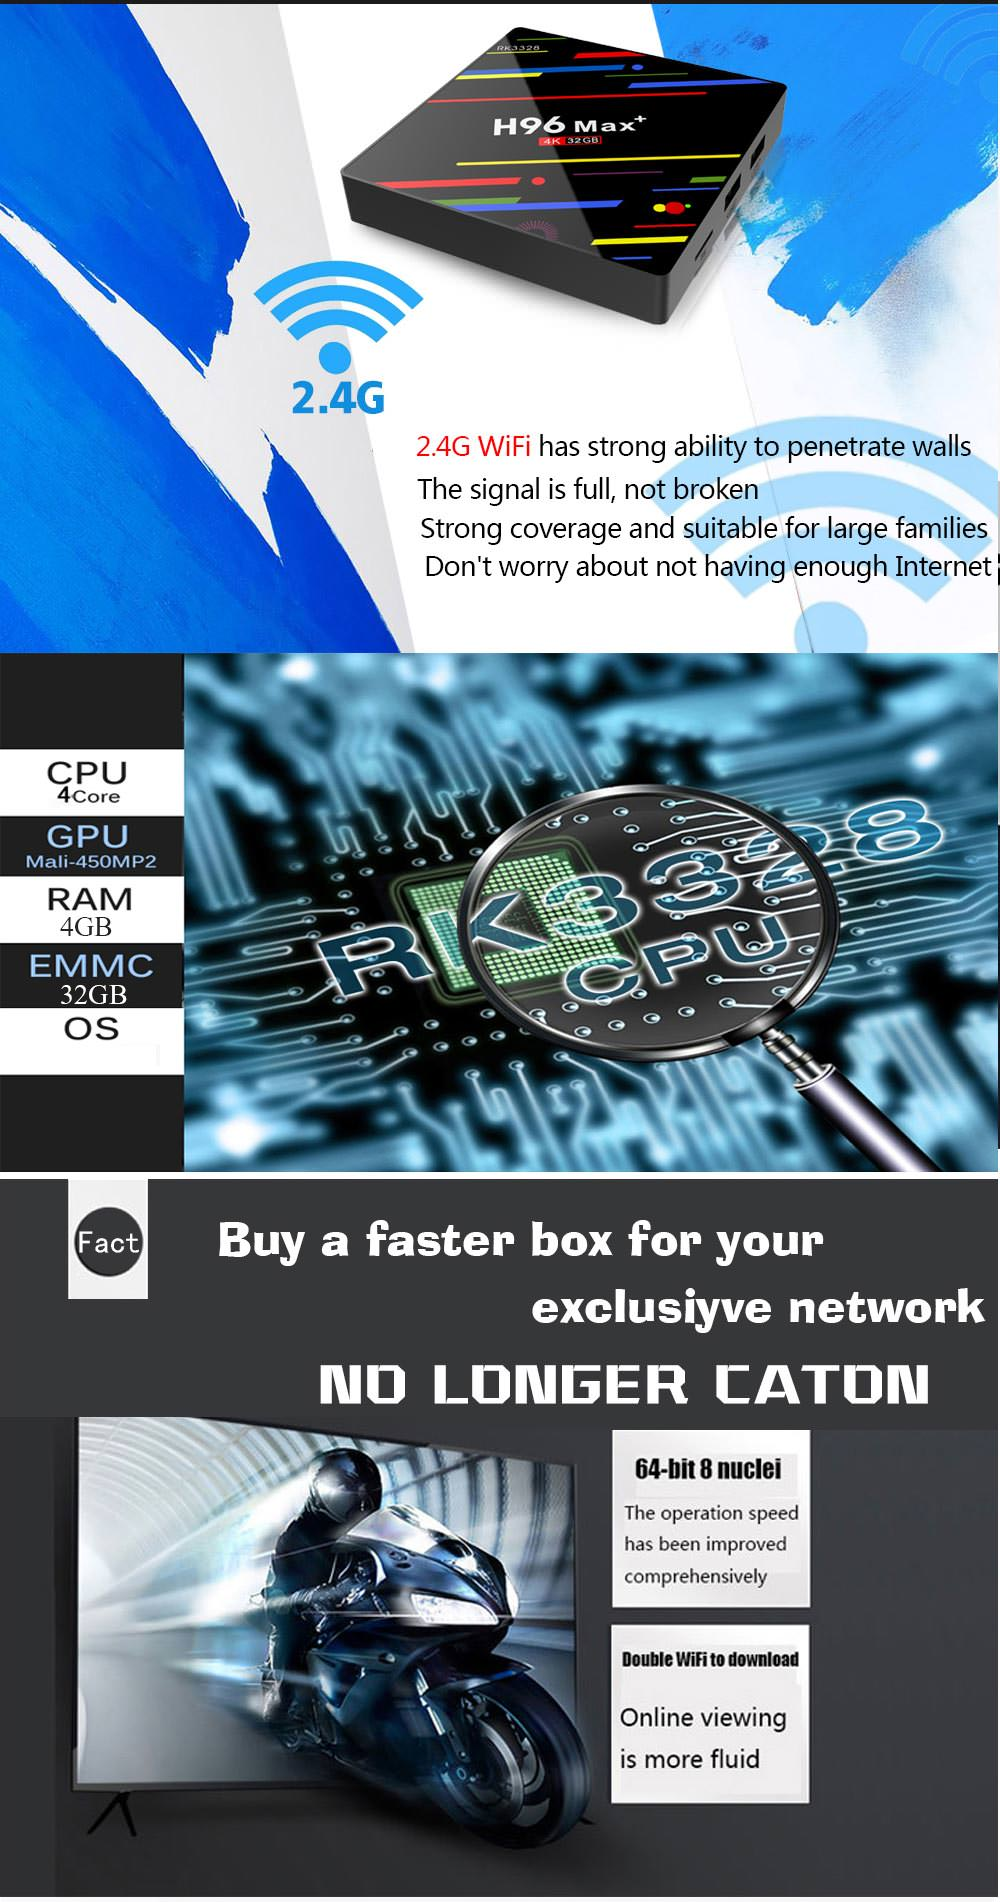 h96 max+ tv box 4gb 32gb price